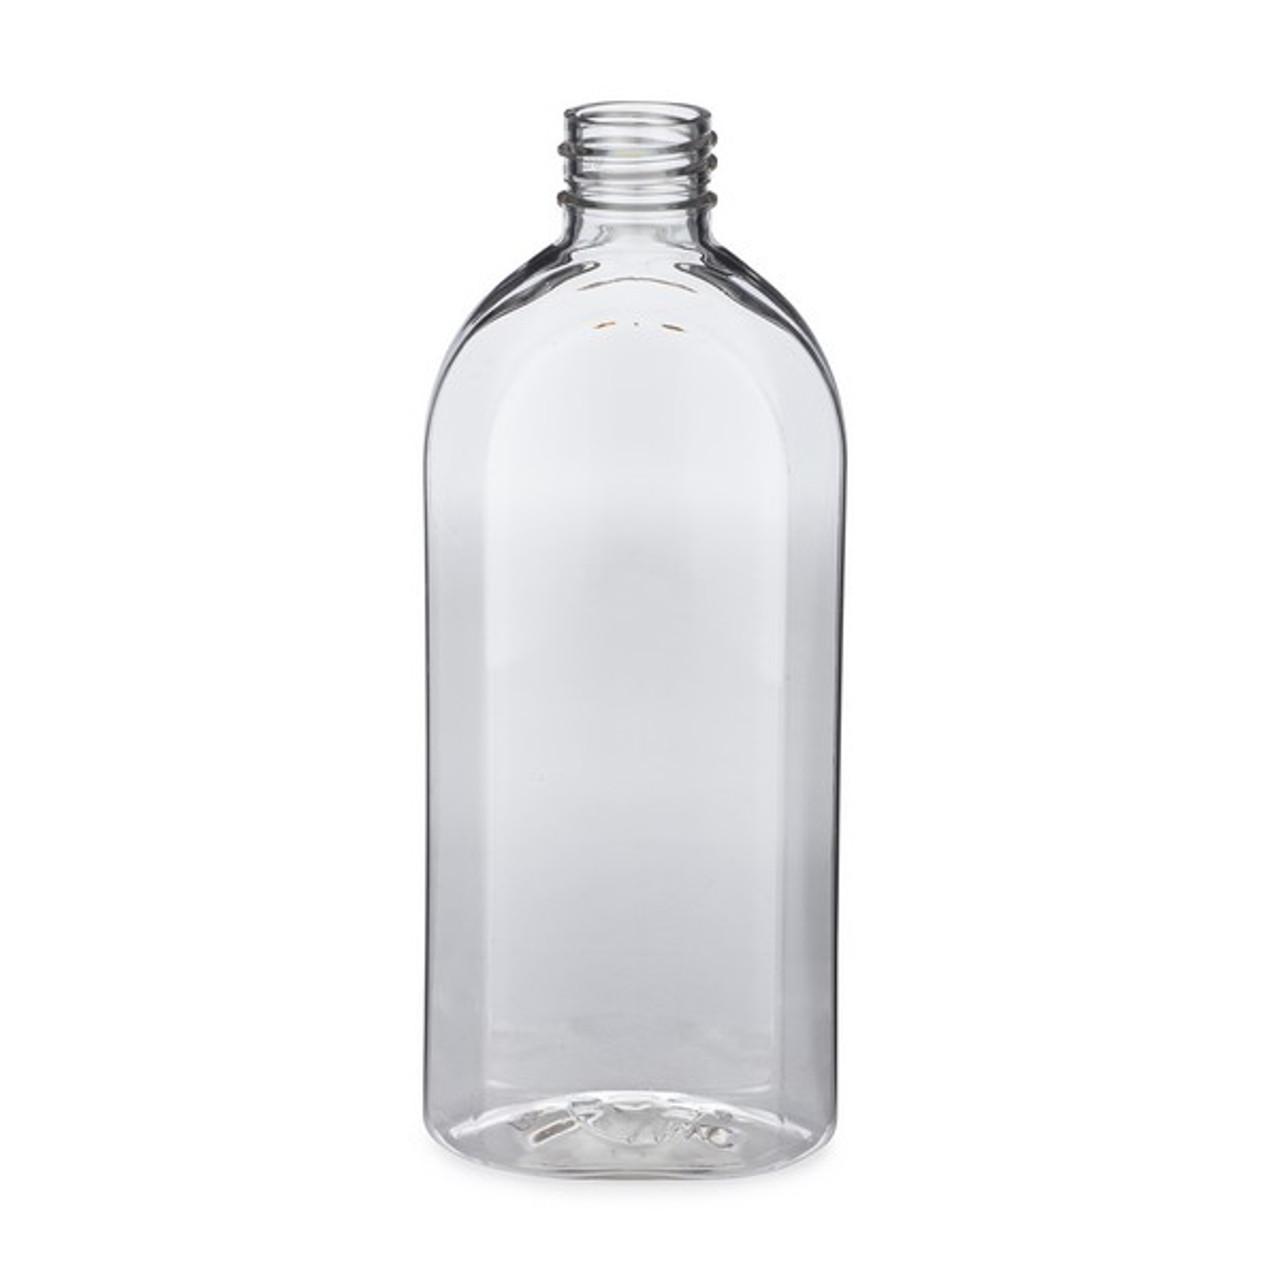 5fb362e14d4c 8 oz Clear PET Plastic Extract Bottles (Cap Not Included) - 3103B04-BCLR